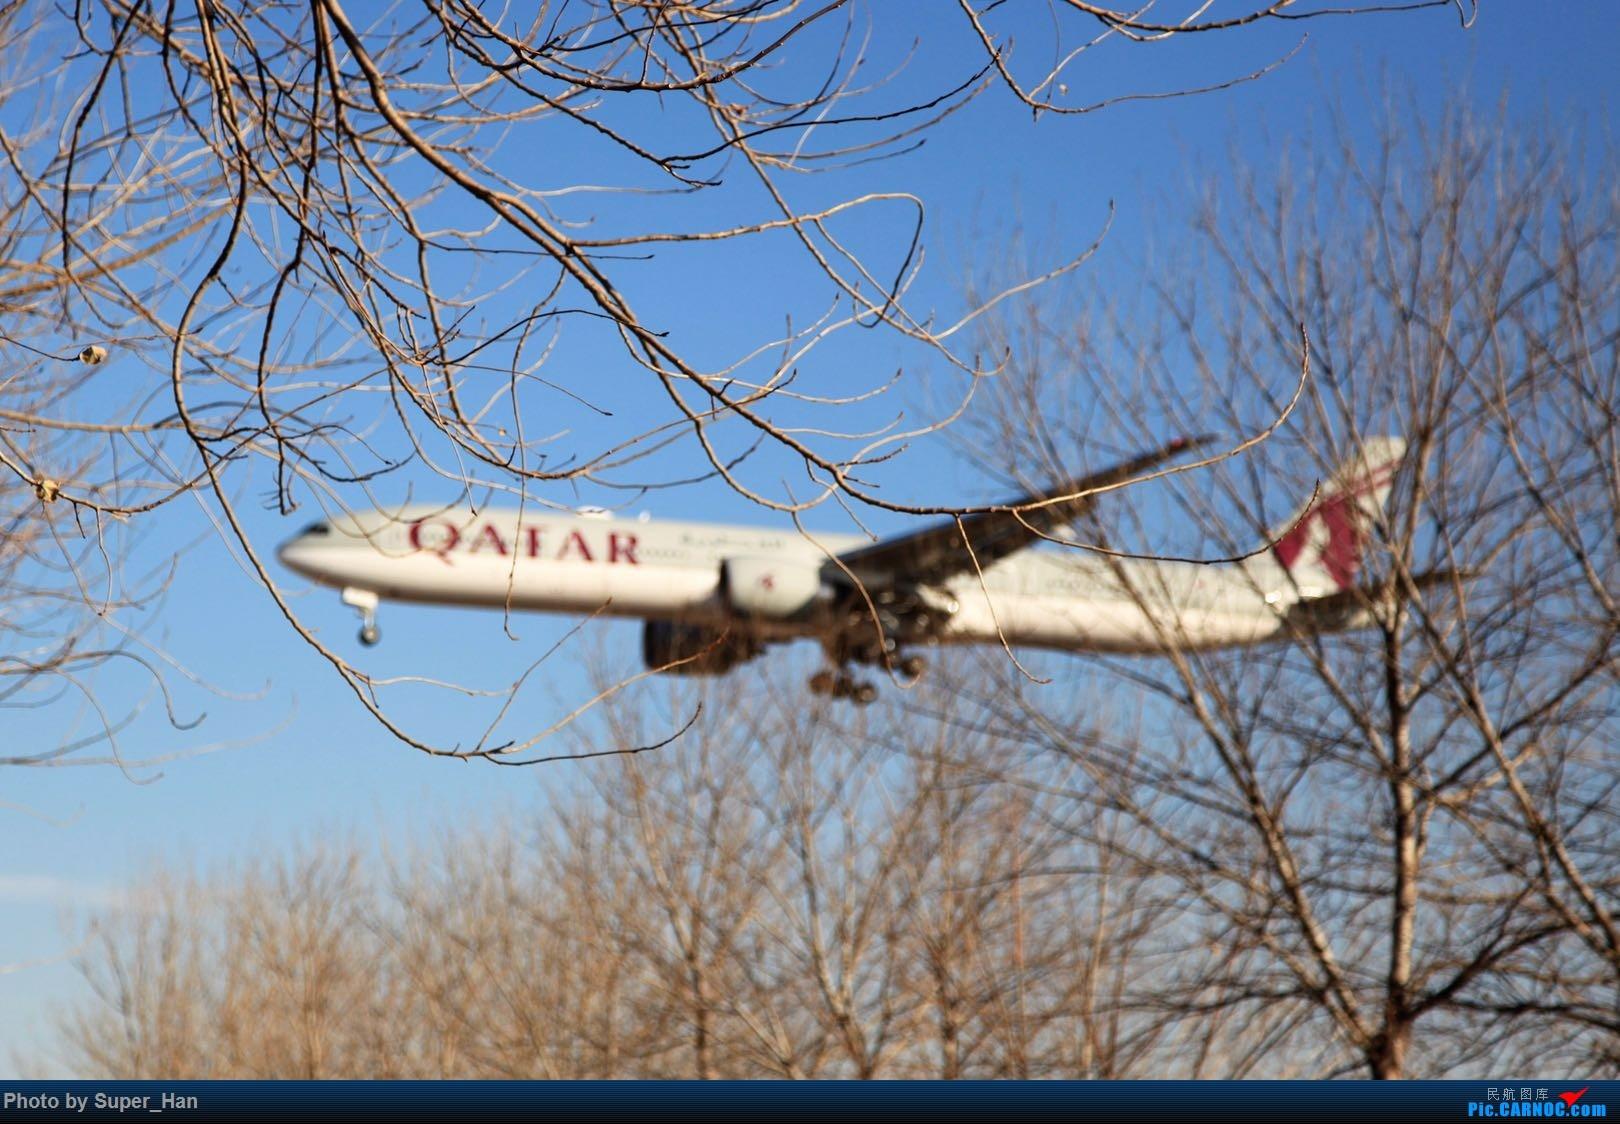 Re:[原创]1月17日PEK BOEING 777-300ER A7-BEV 中国北京首都国际机场